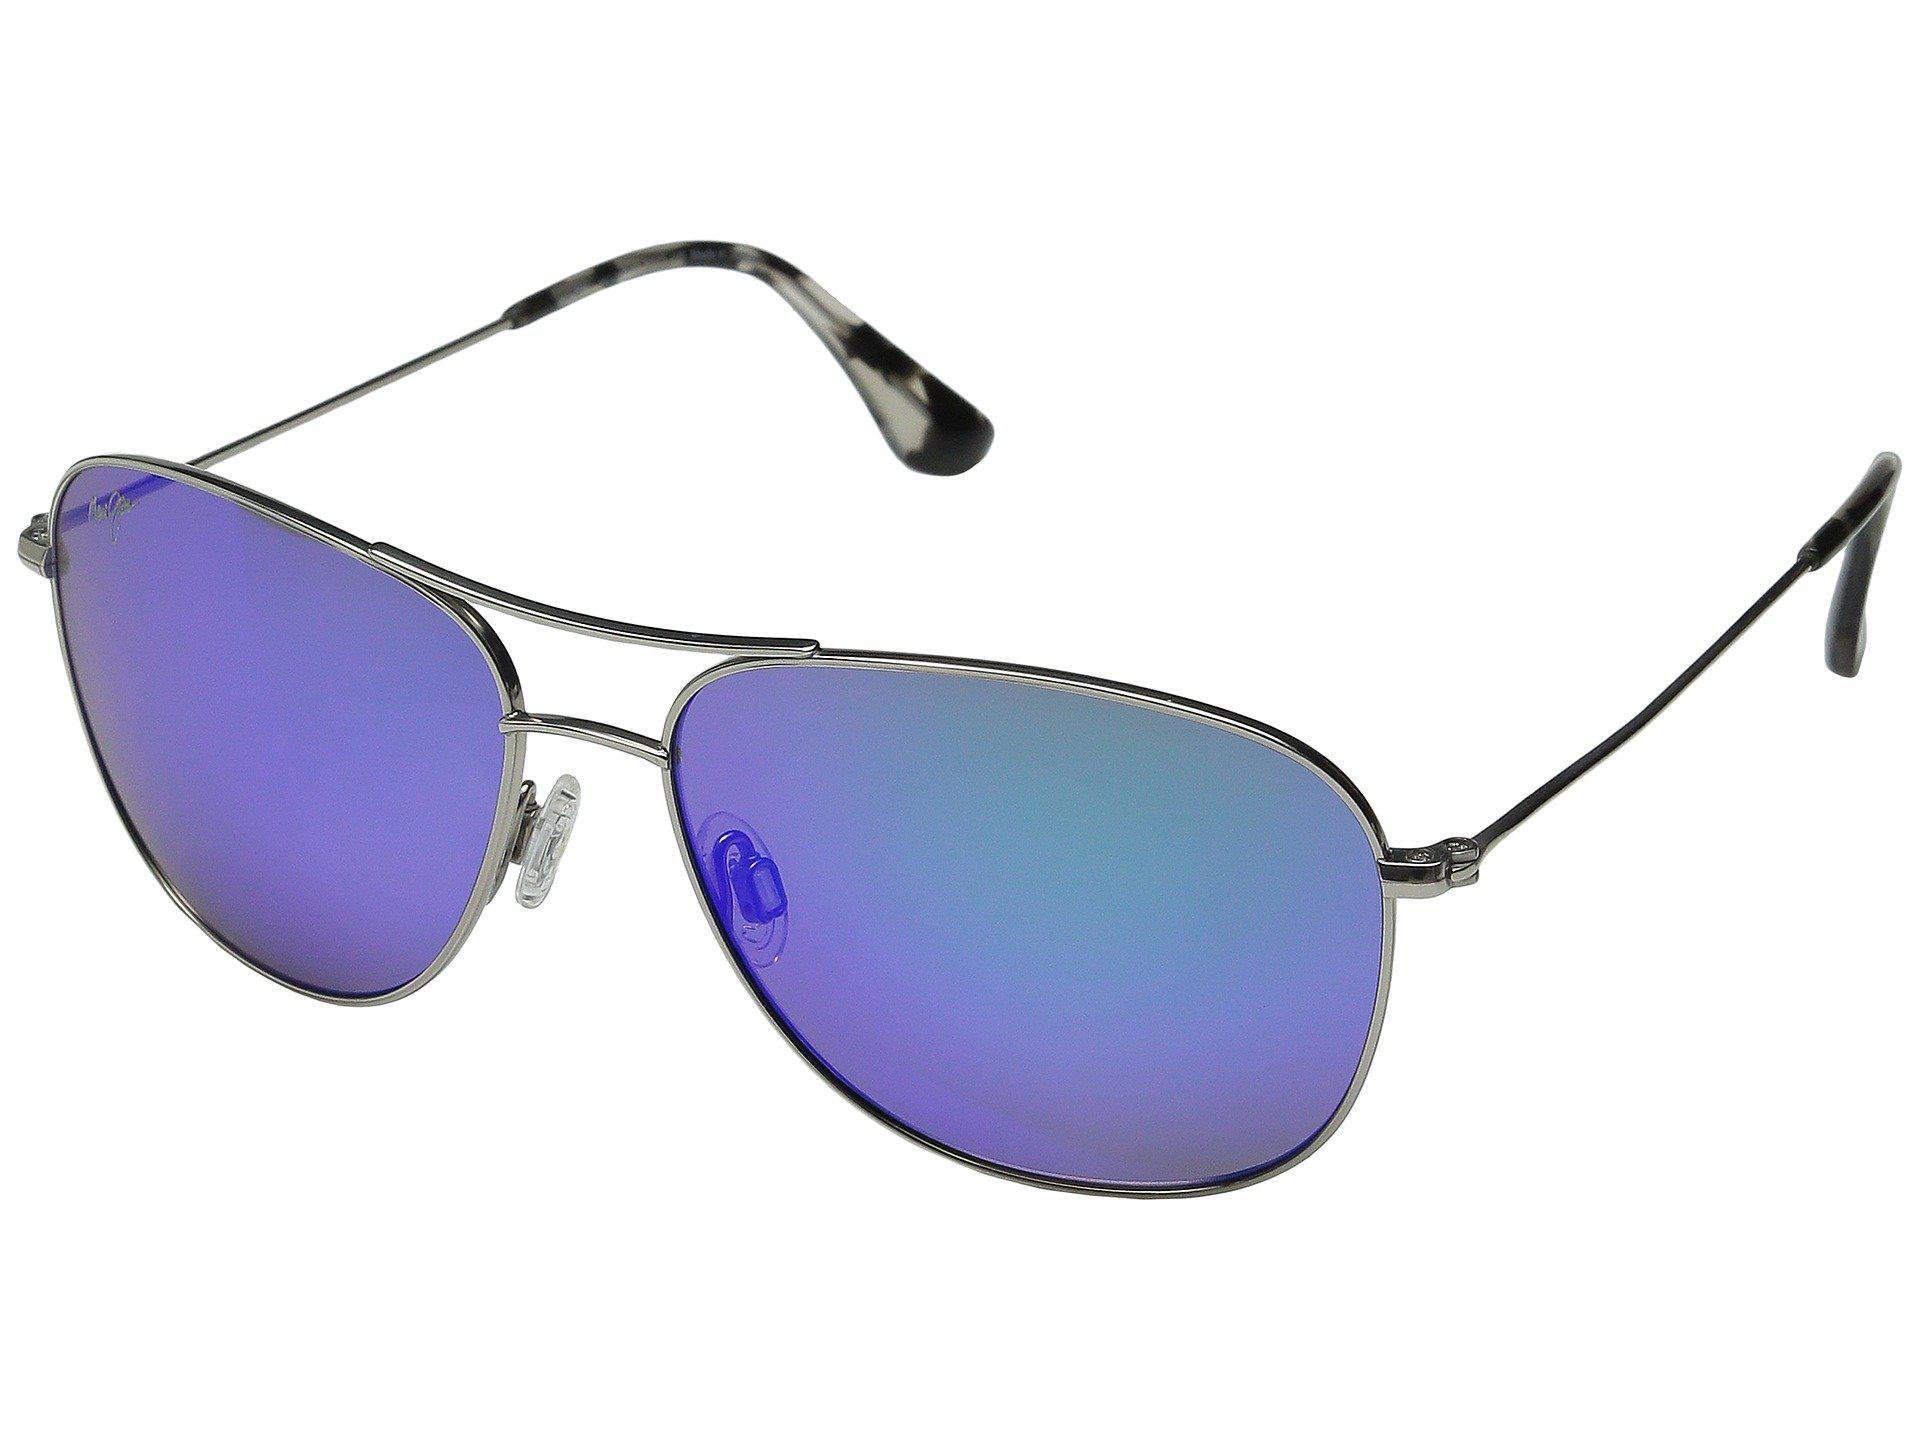 e94980a1279 Lyst - Maui Jim Cliff House (silver blue Hawaii) Sport Sunglasses in ...